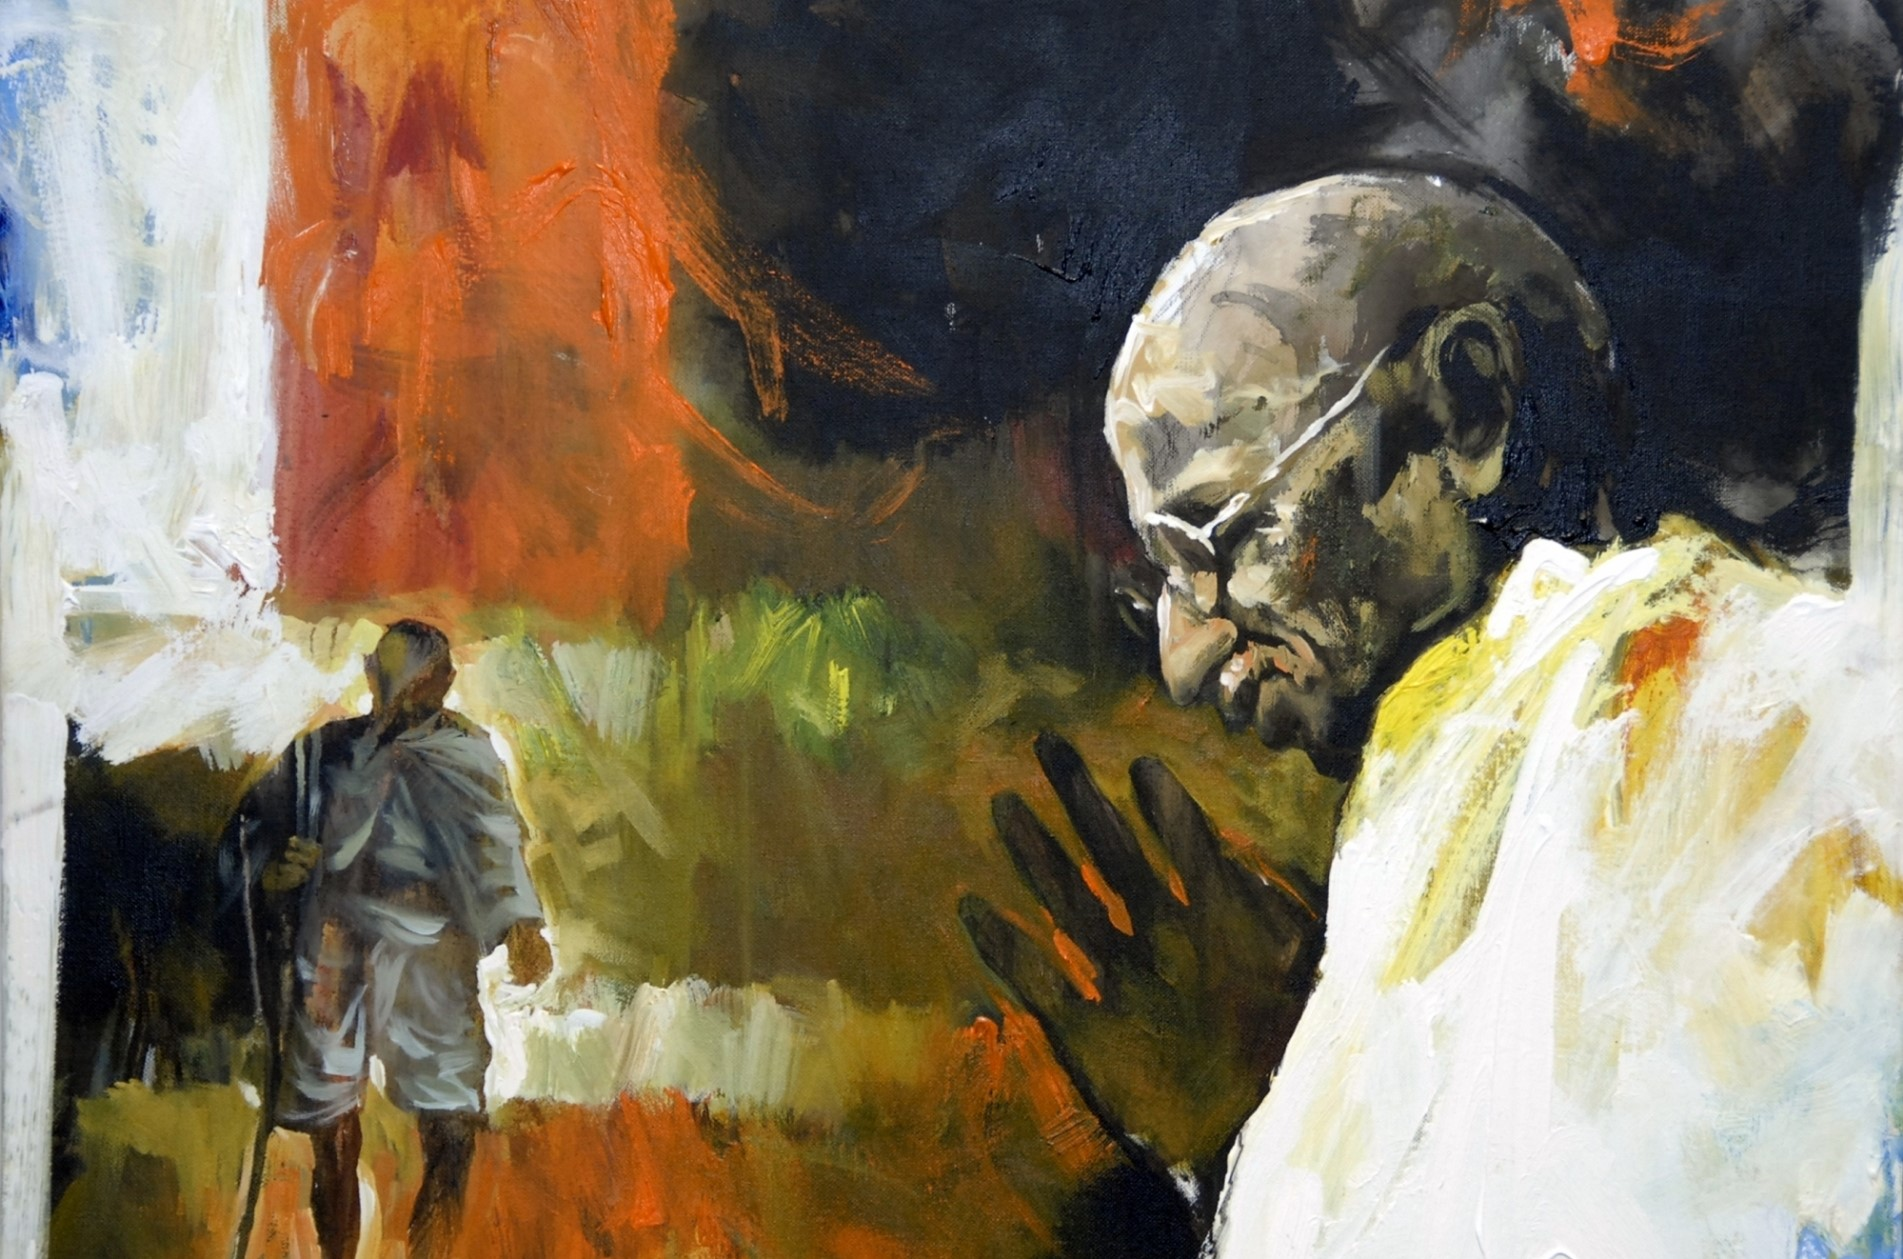 Mahatma Gandhi 'real source of inspiration' for Palestinians: Senior leader